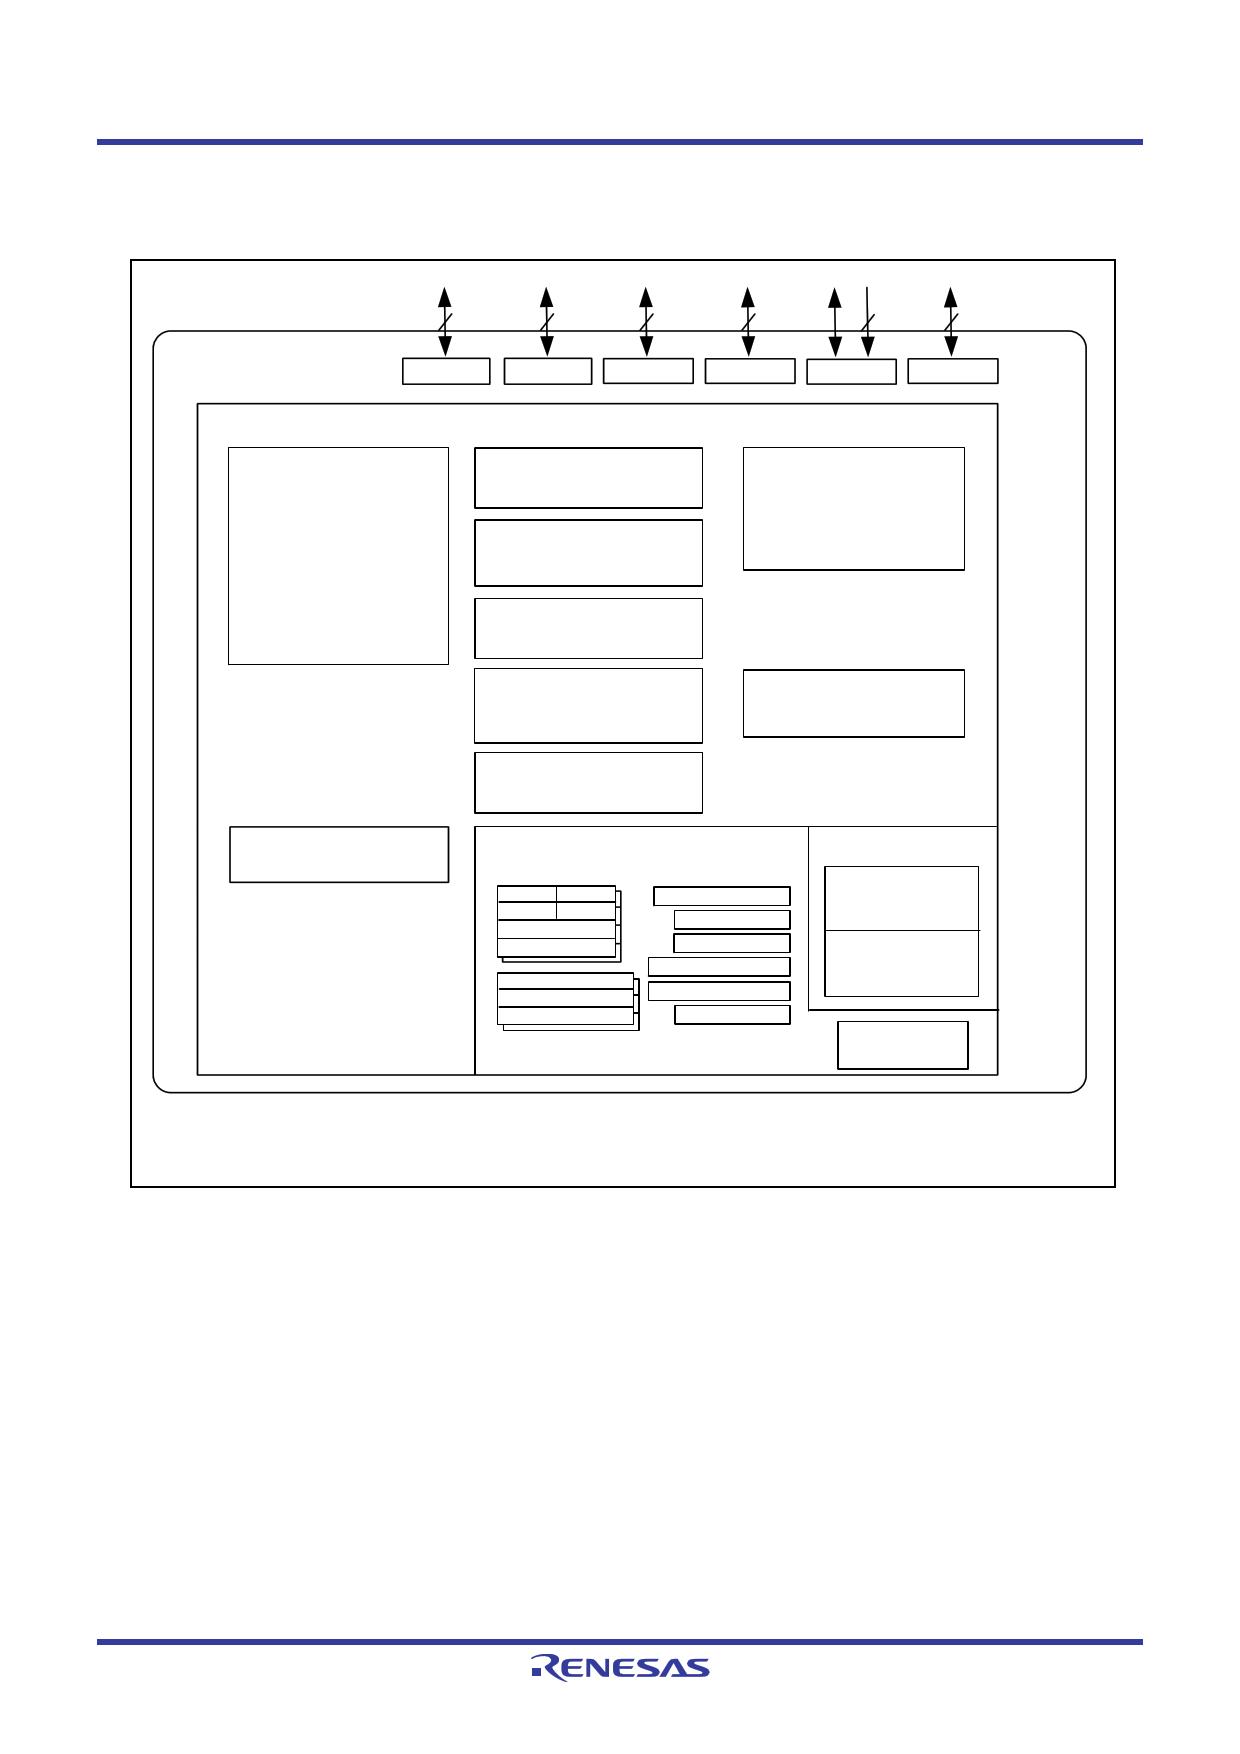 R5F21228JFP pdf, 반도체, 판매, 대치품